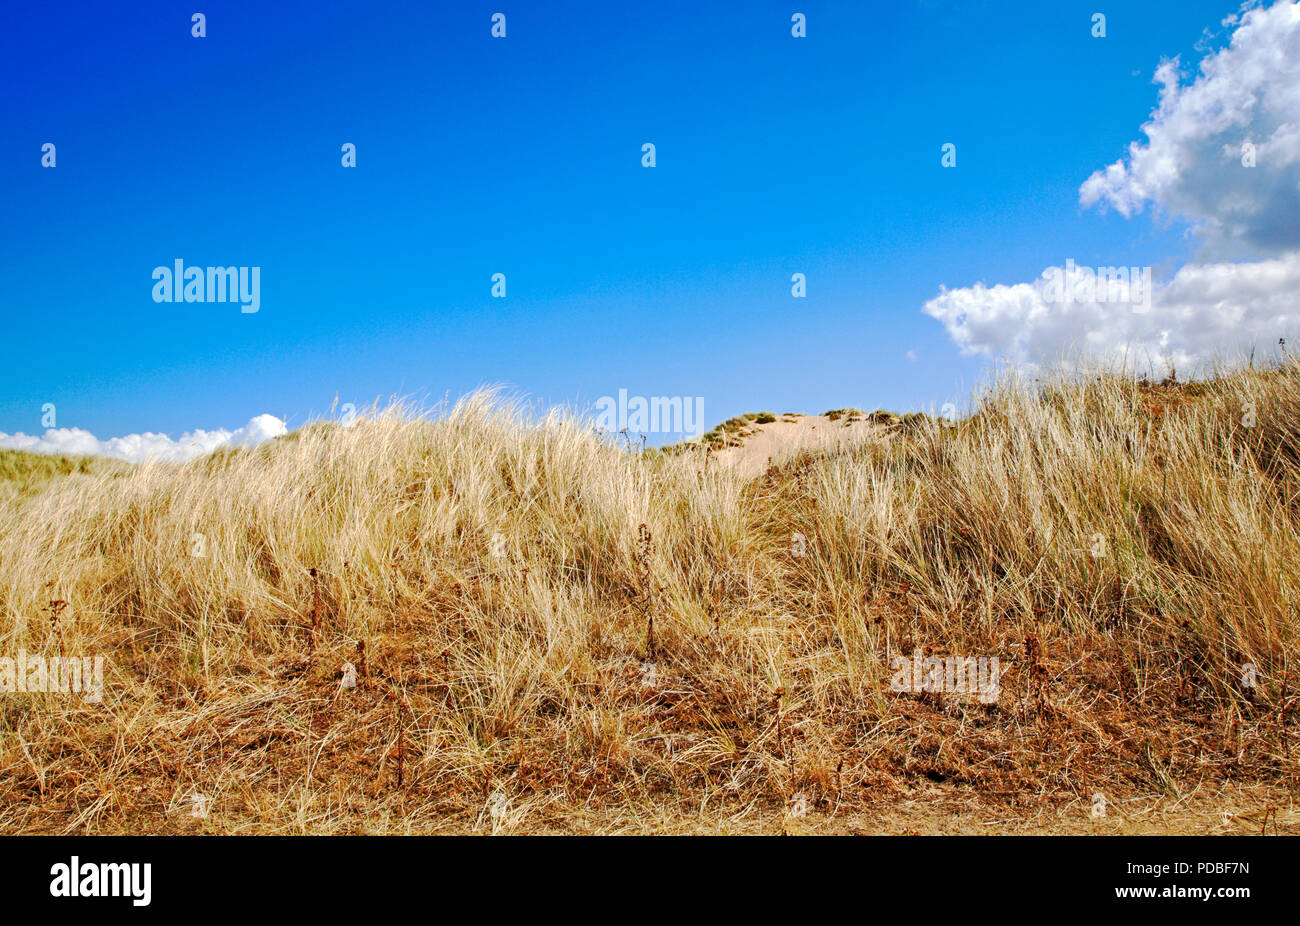 Marram Grass, Ammophilia arenaria, on sand dunes on the North Norfolk coast at Burnham Overy Staithe, Norfolk, England, United Kingdom, Europe. - Stock Image